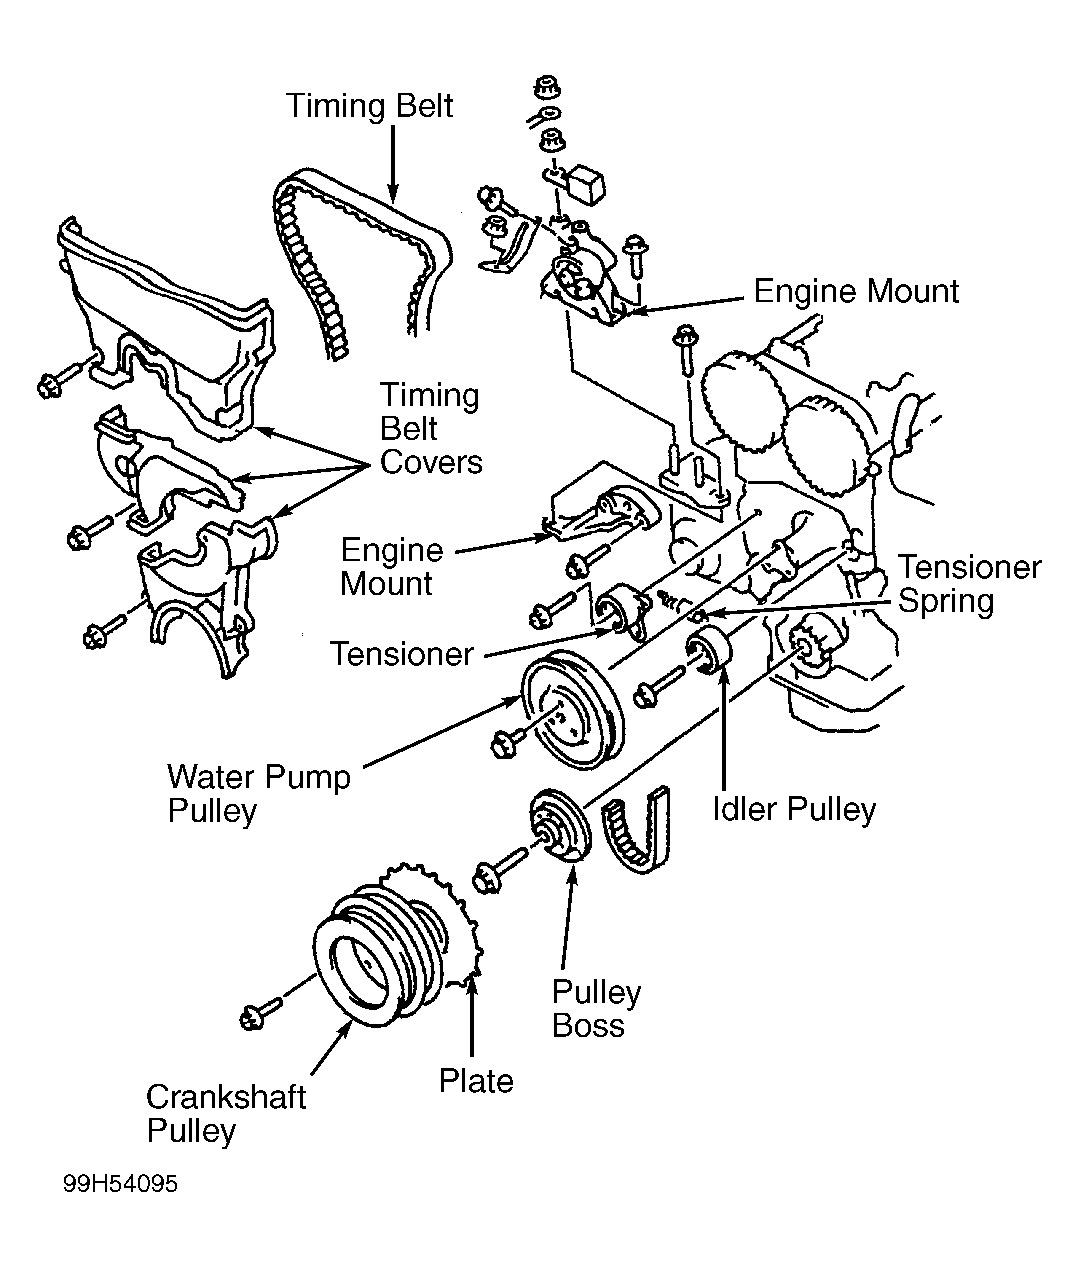 1998 mazda protege water pump belt diagram